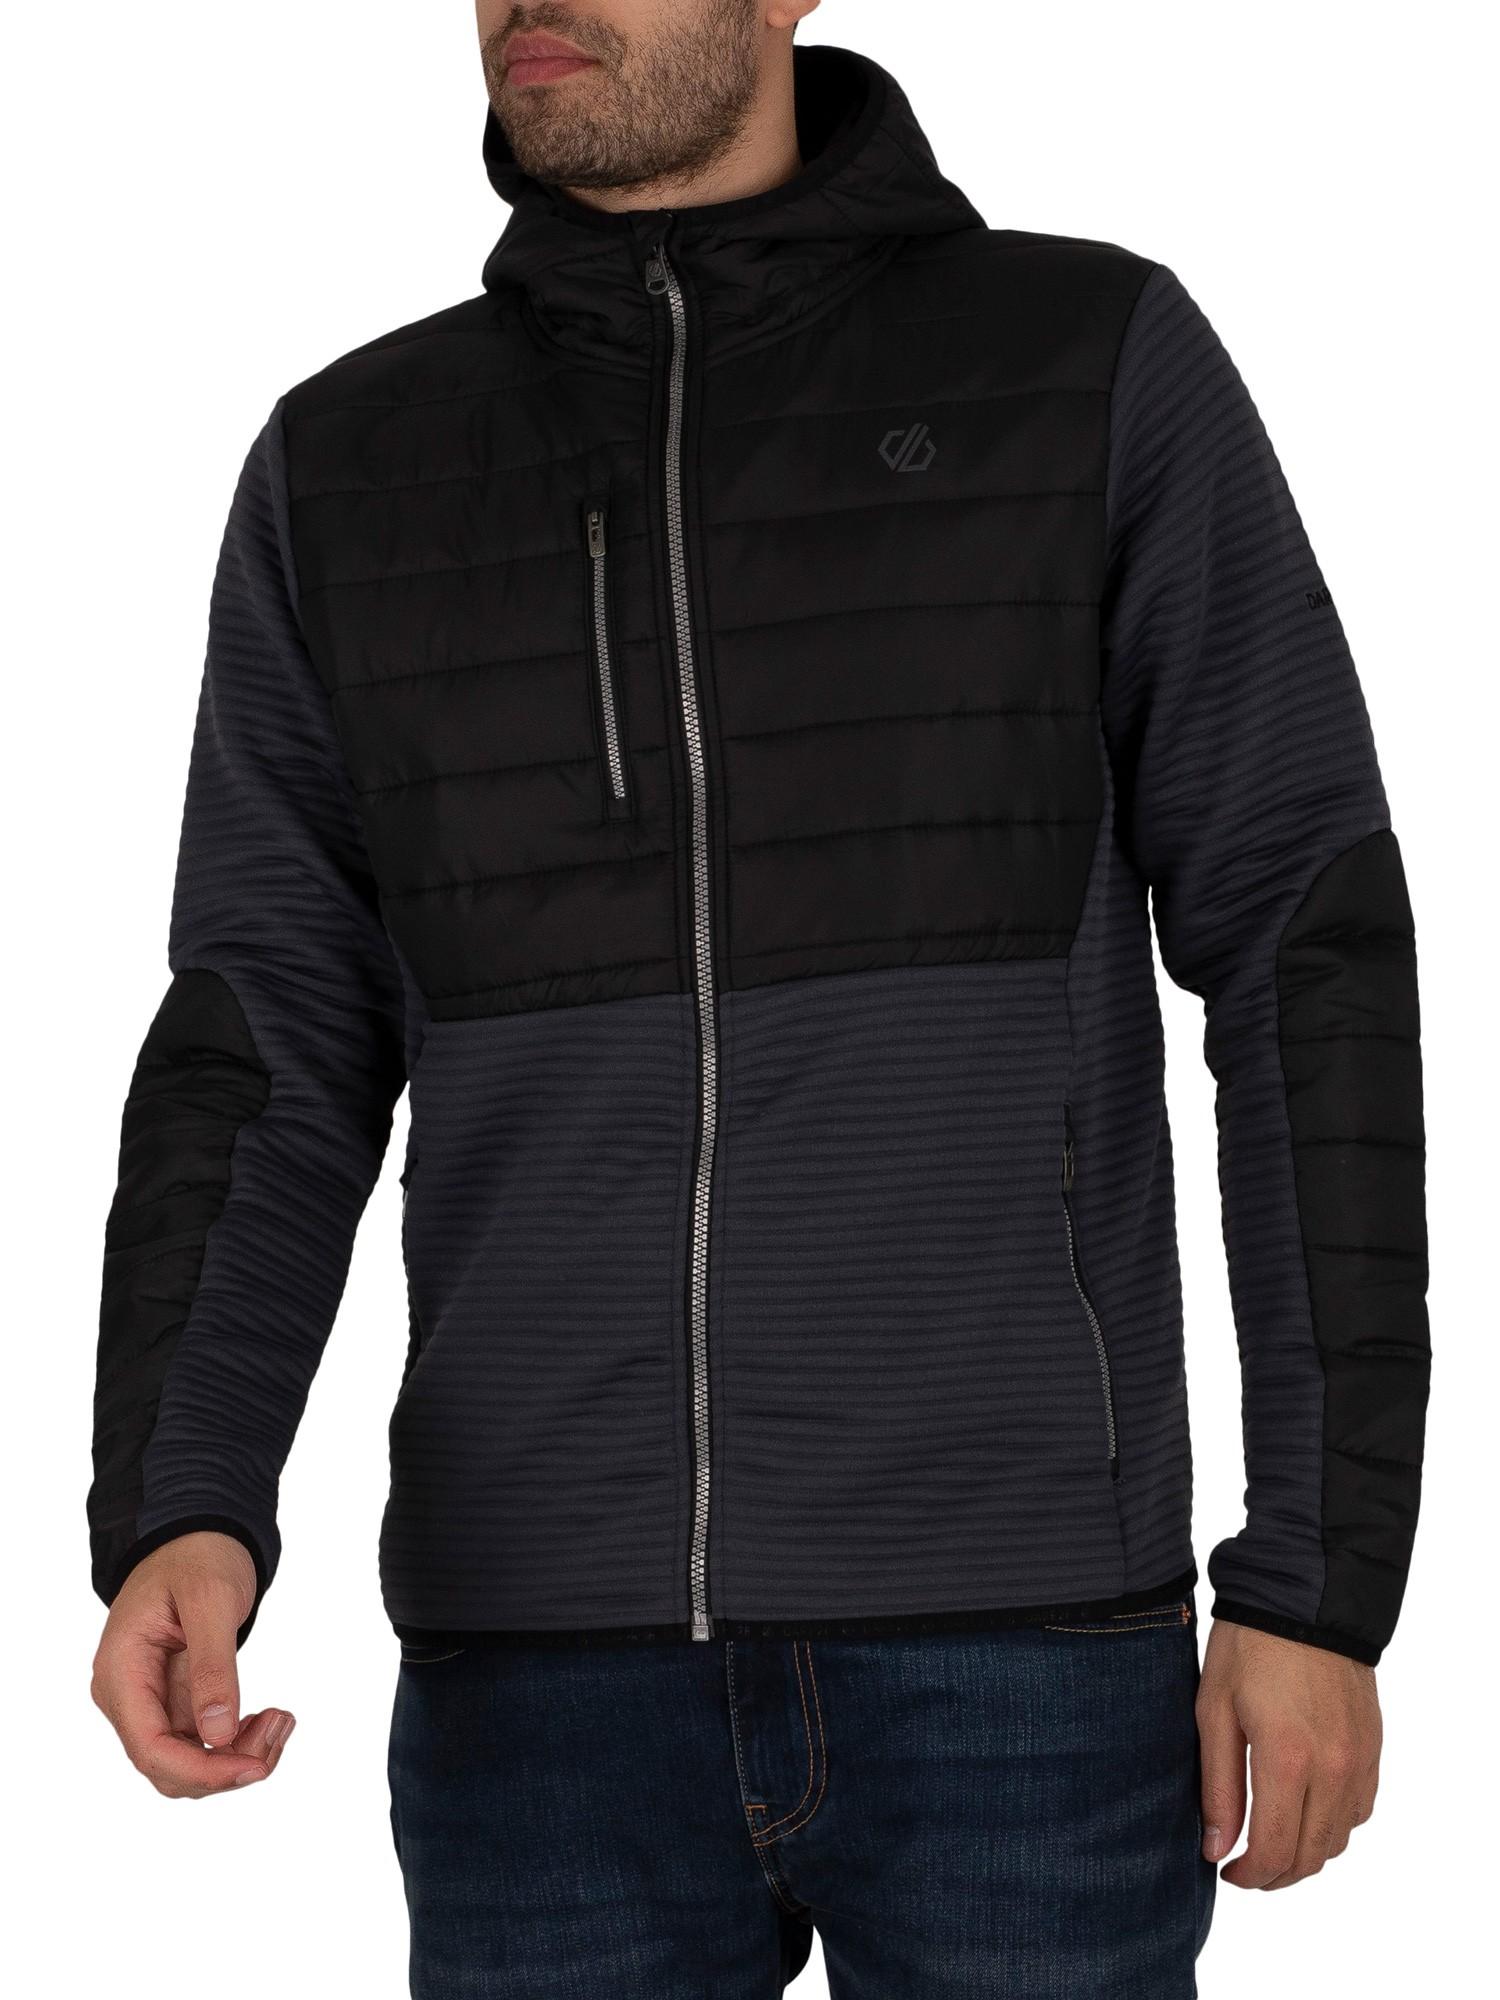 Narrative Full Zip Hooded Jacket